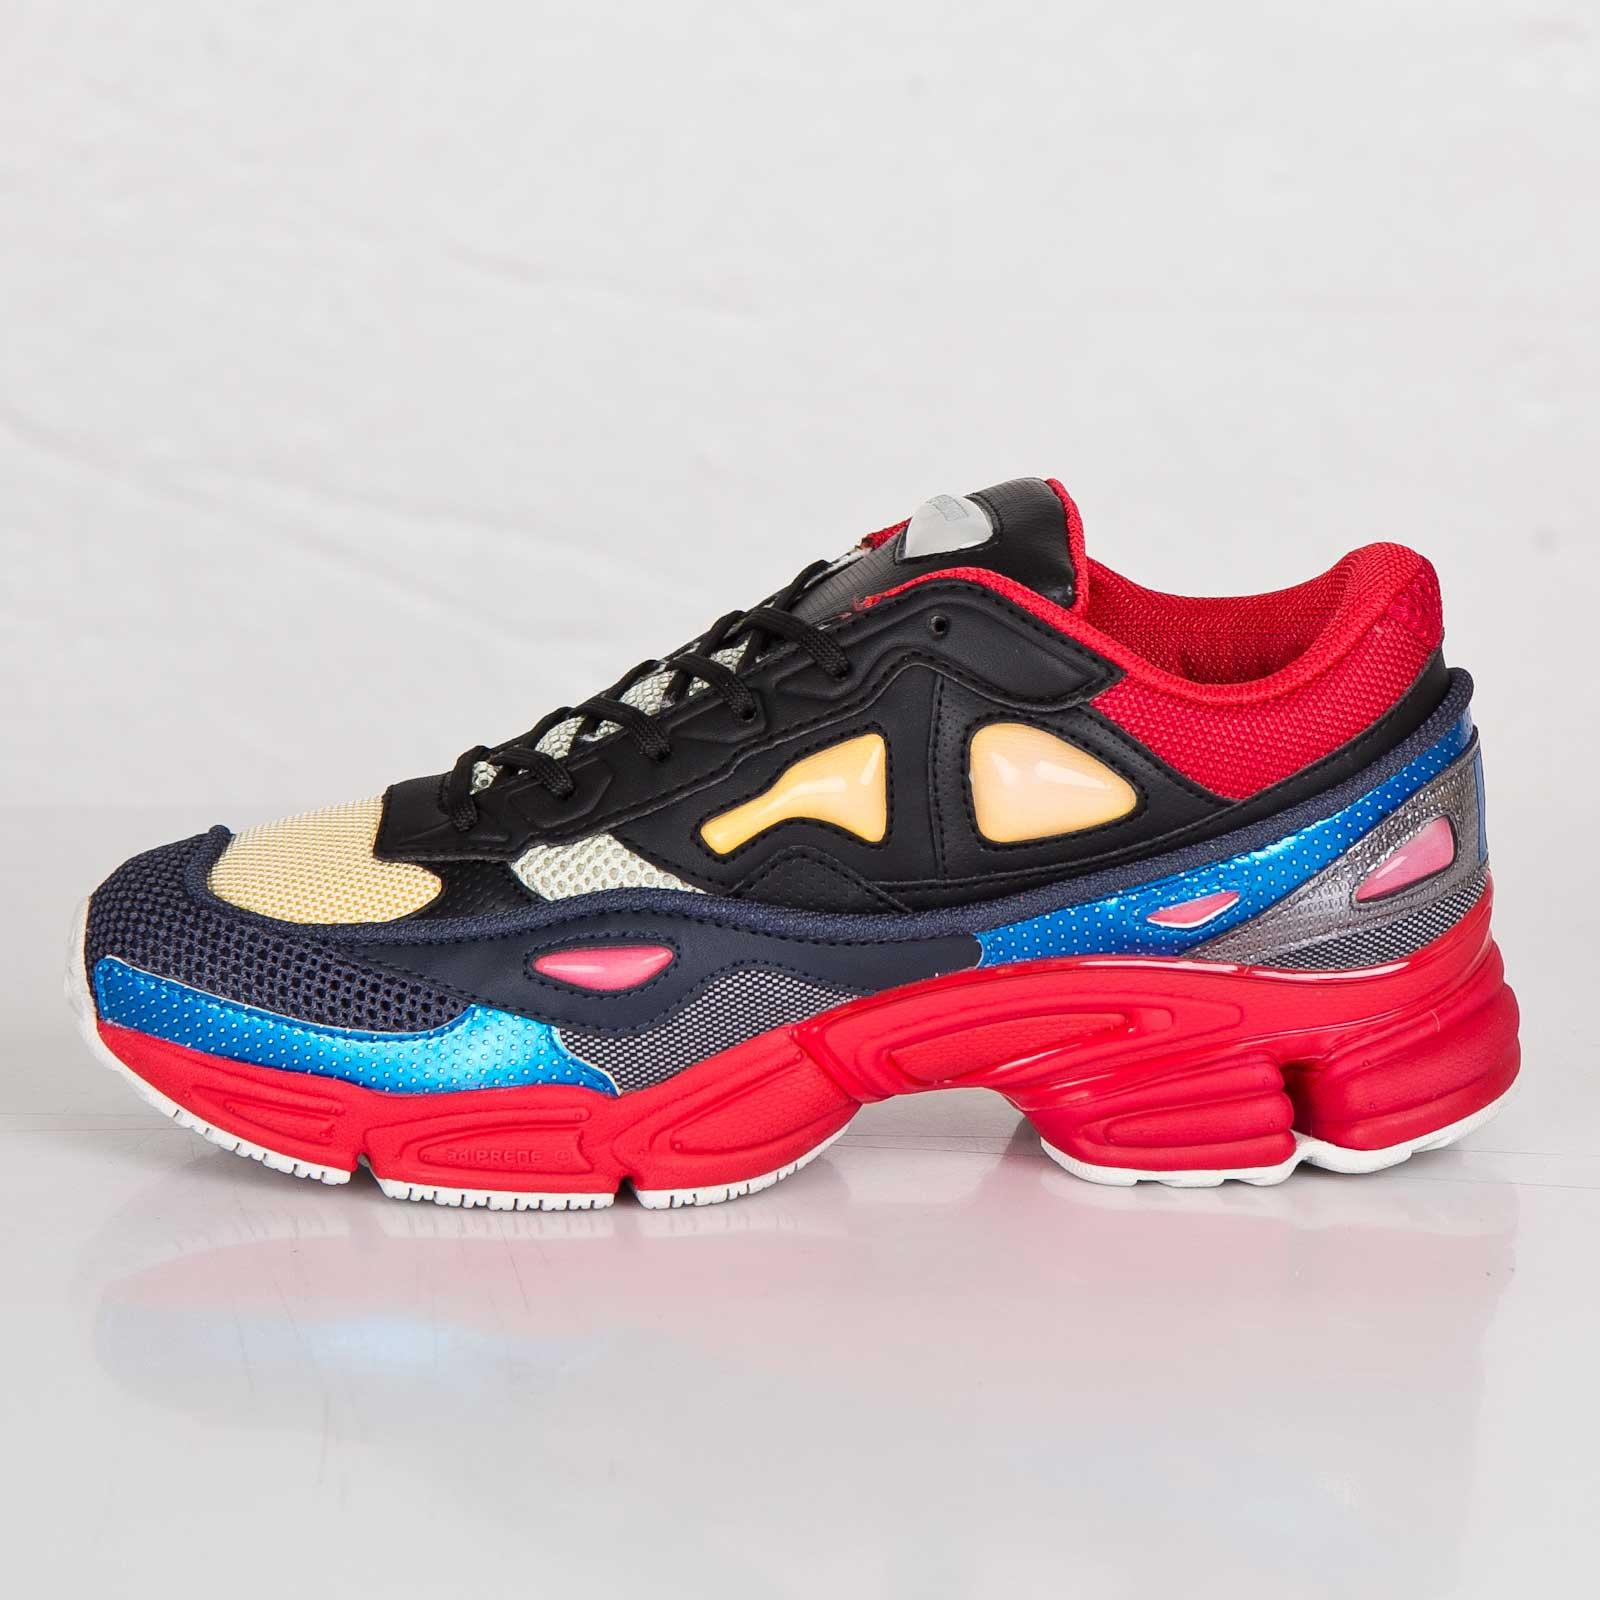 detailed pictures 0241c edc29 adidas Raf Simons Ozweego 2 - B26076 - Sneakersnstuff ...